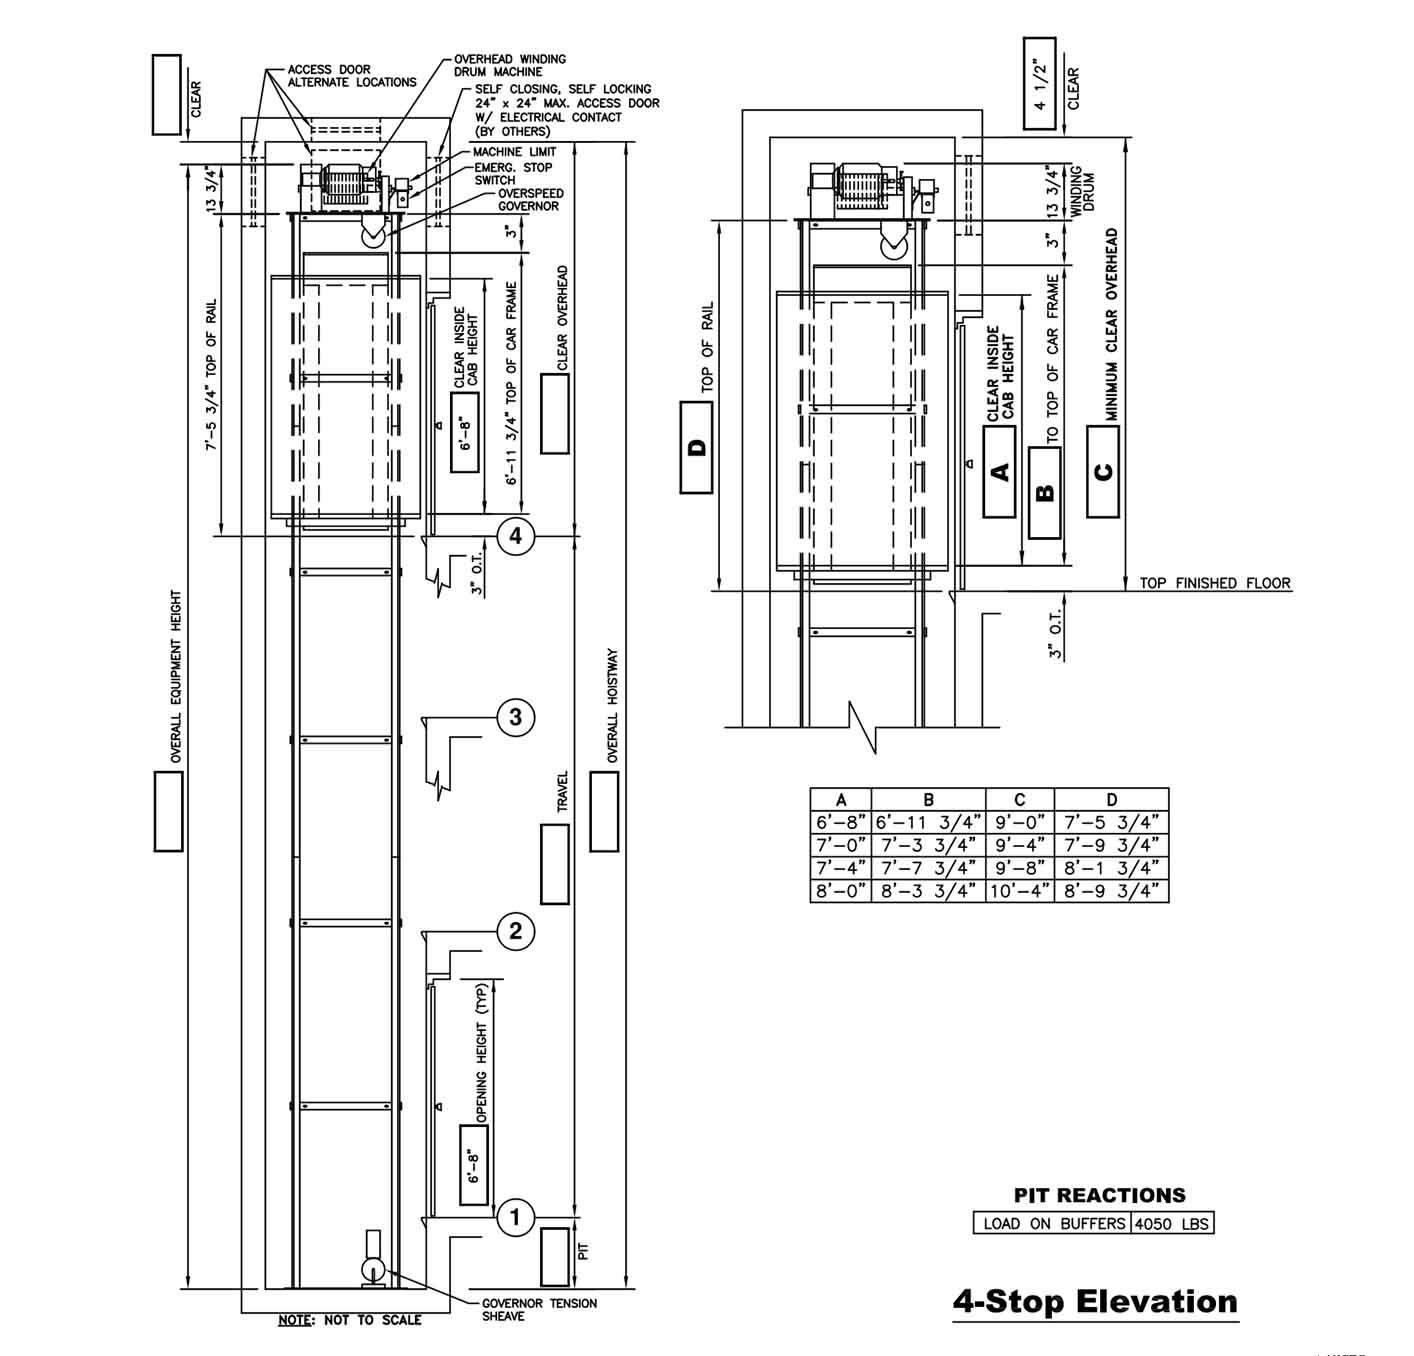 hight resolution of cable drive drawings custom elevator elevator house elevation roronoa zoro crossword